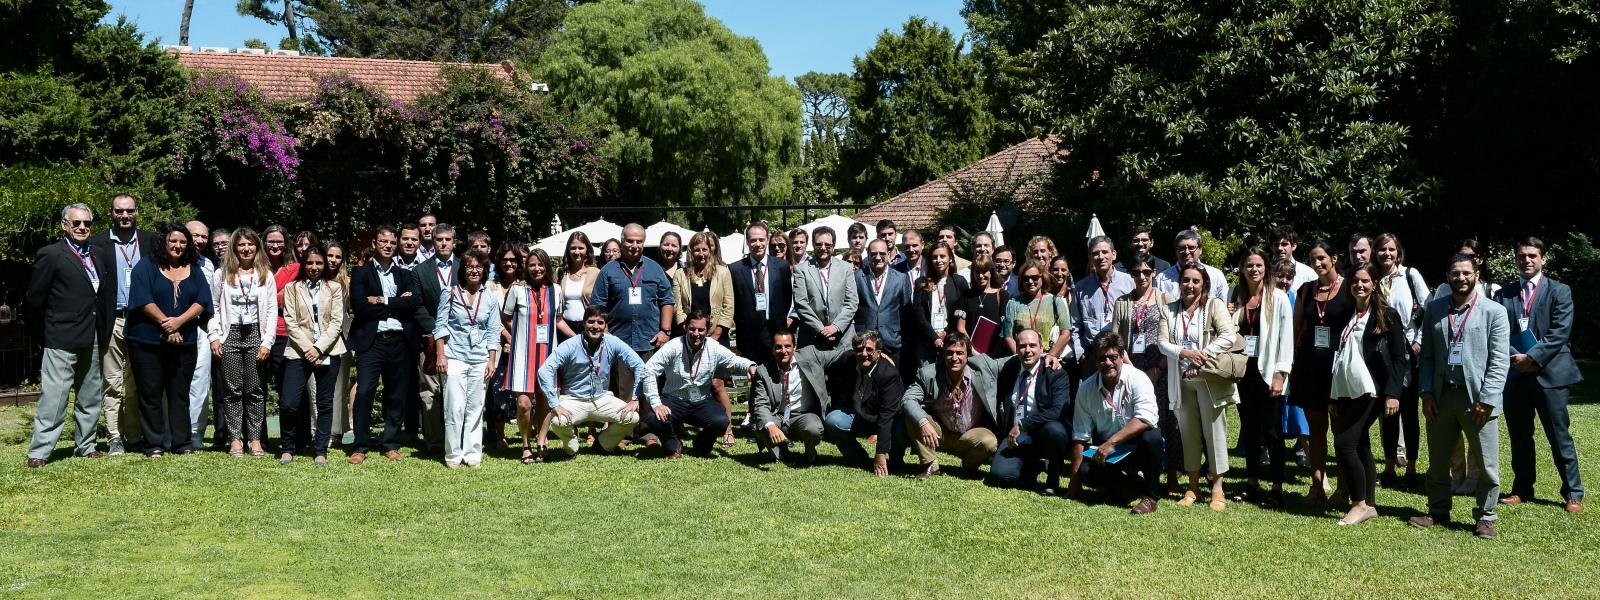 La Uruguay Tax Conference reunió a gran número de expertos en fiscalidad internacional